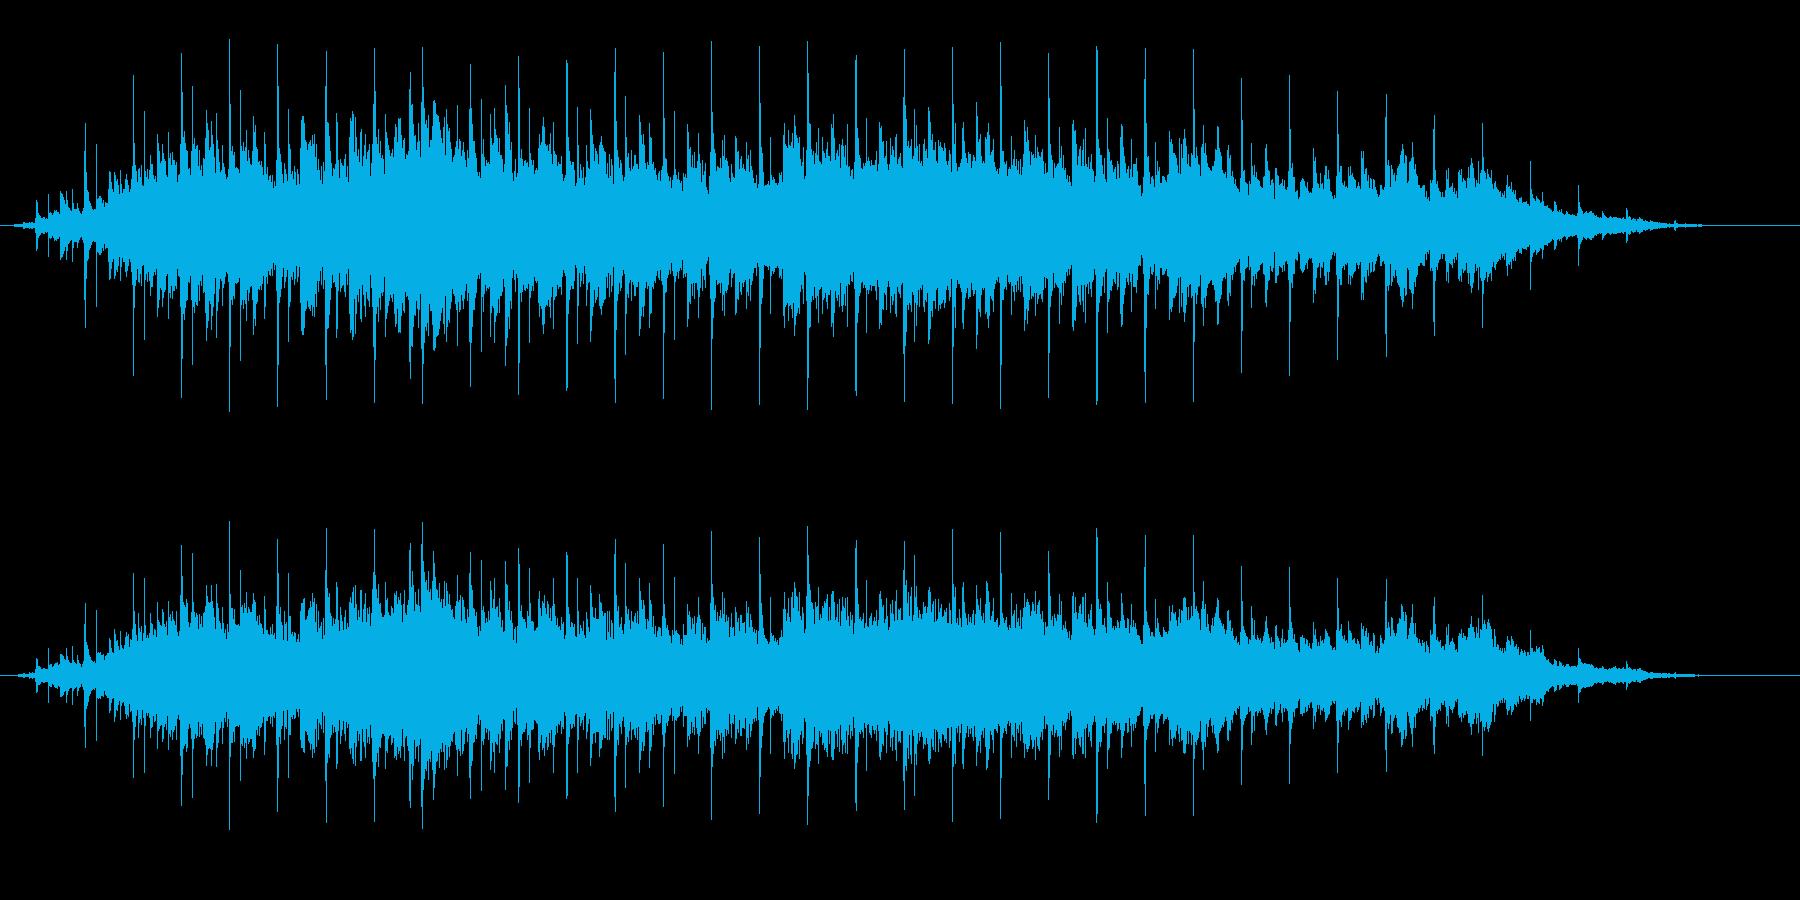 SONHOの再生済みの波形